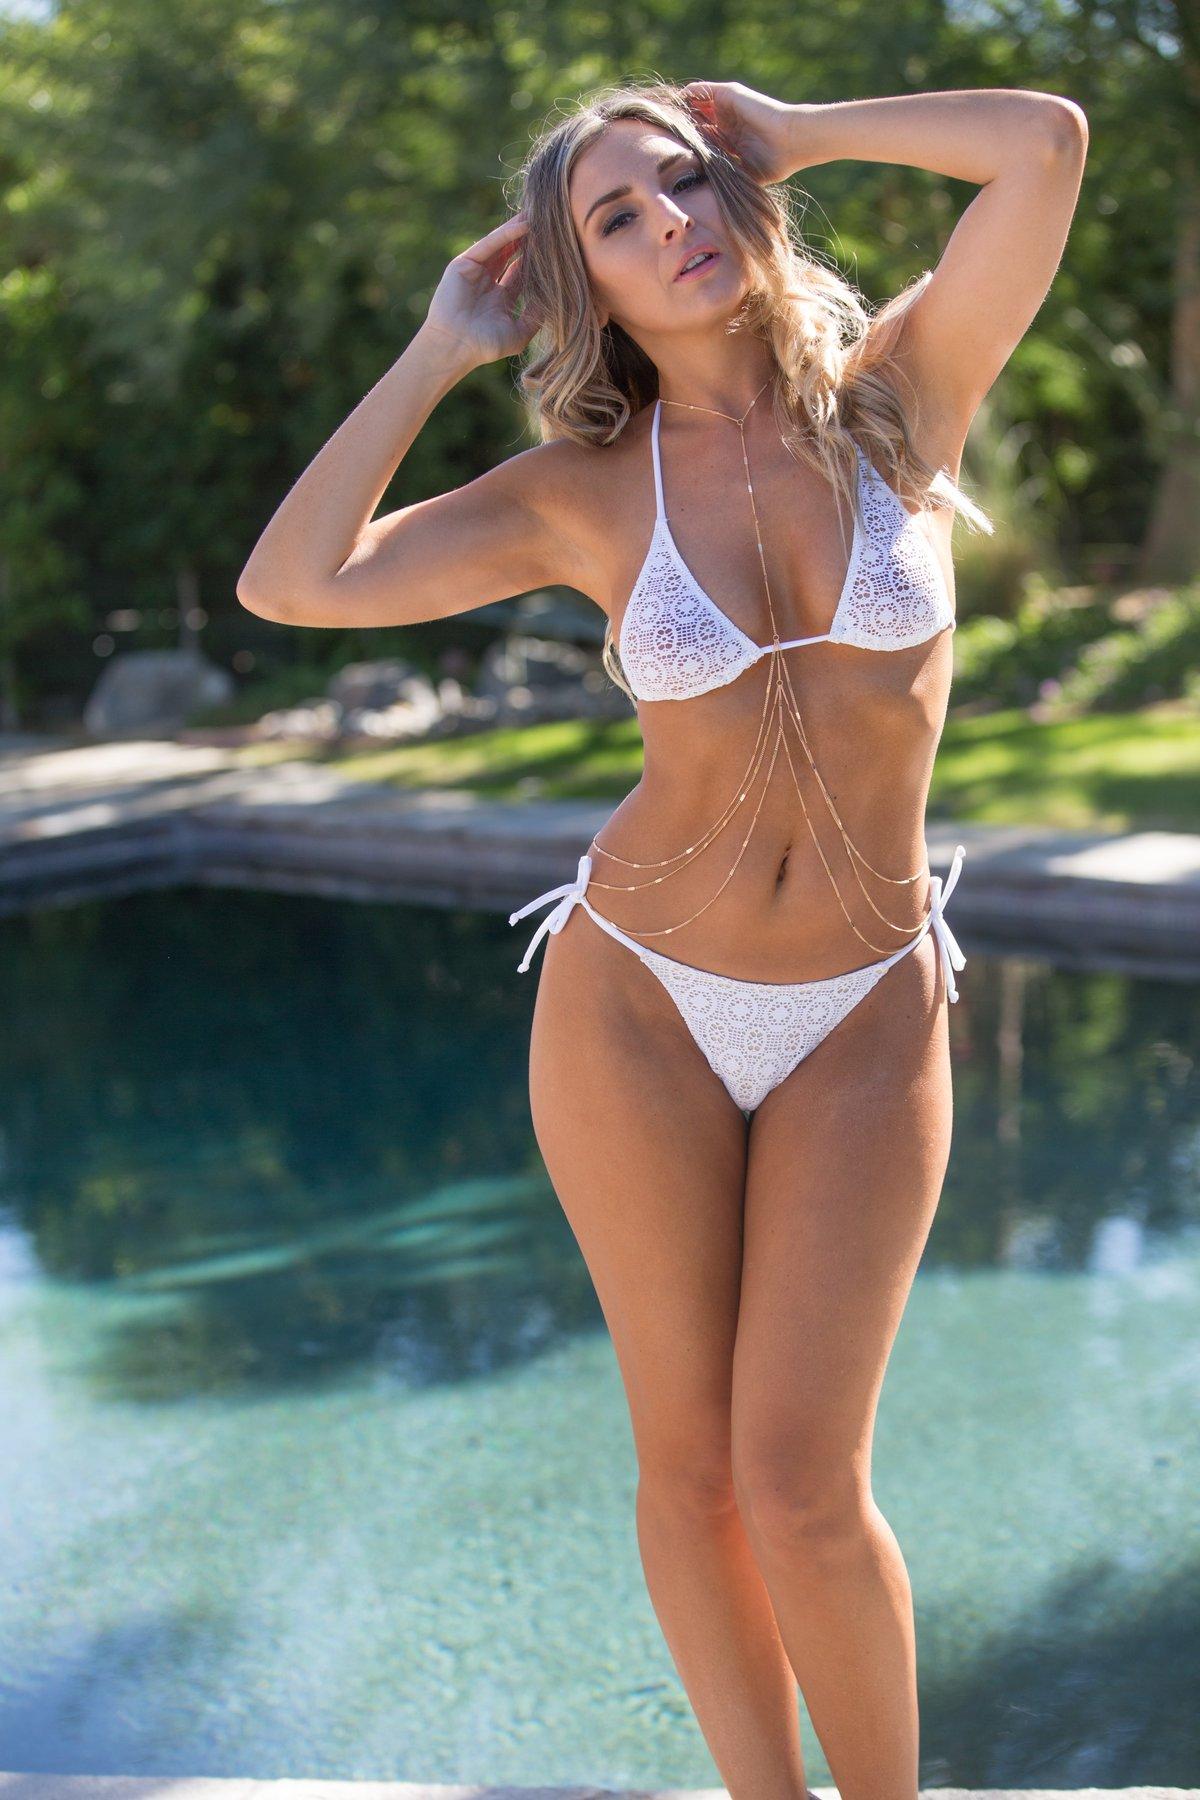 Hot girls in tight bikinis naked